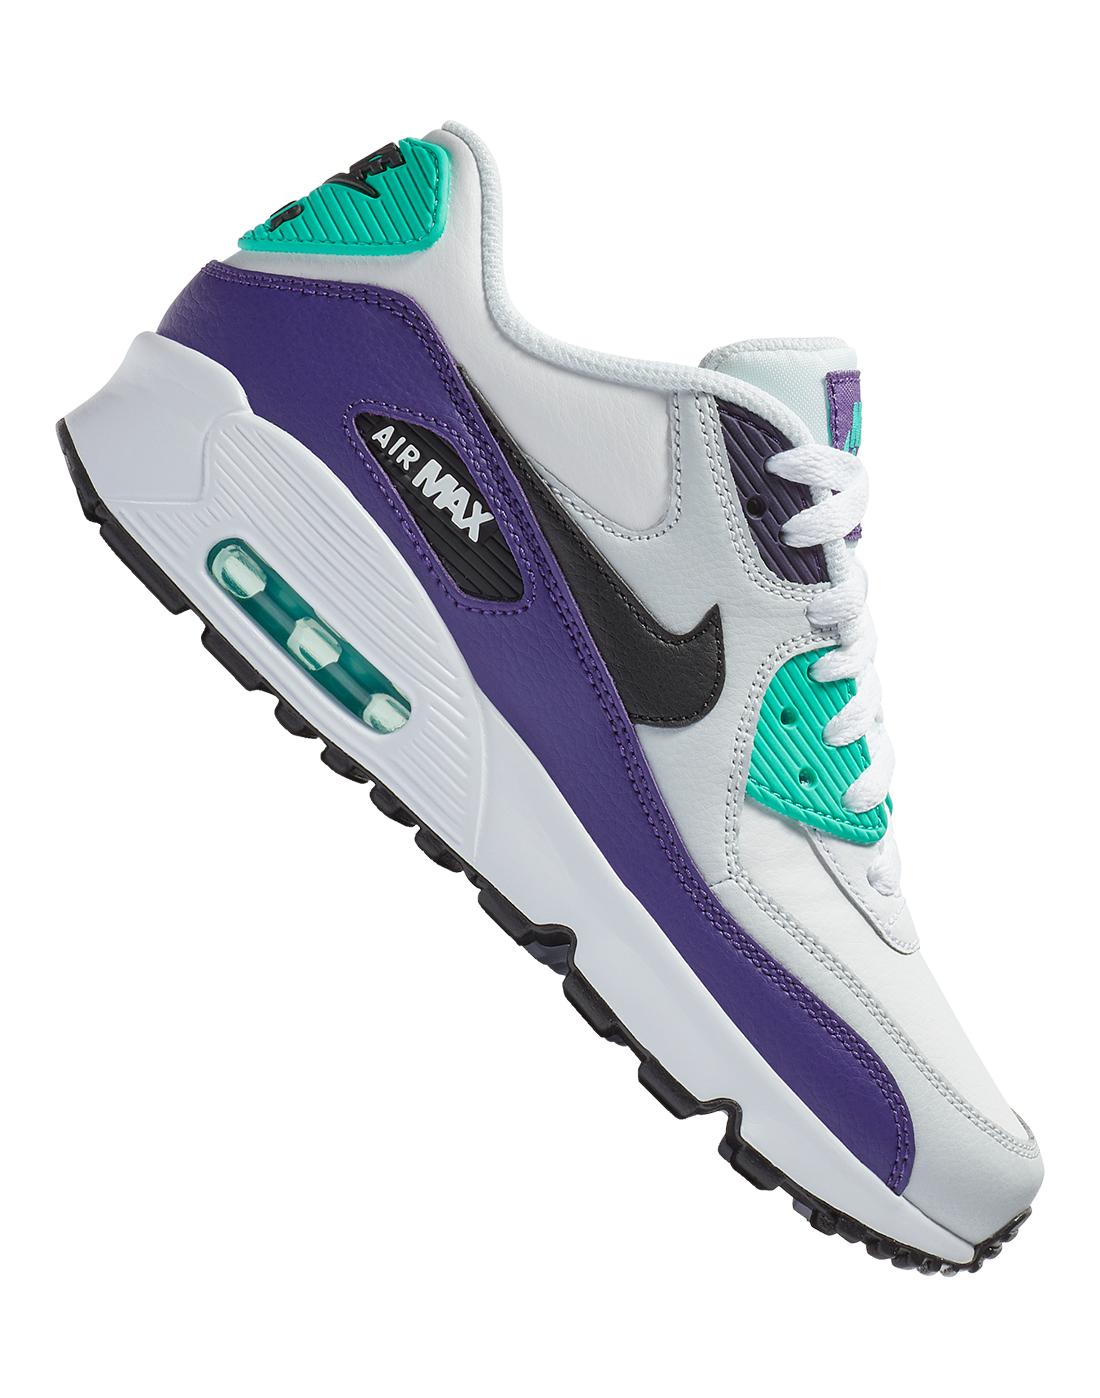 41f5a28899 Kid's White & Purple Nike Air Max 90 | Life Style Sports